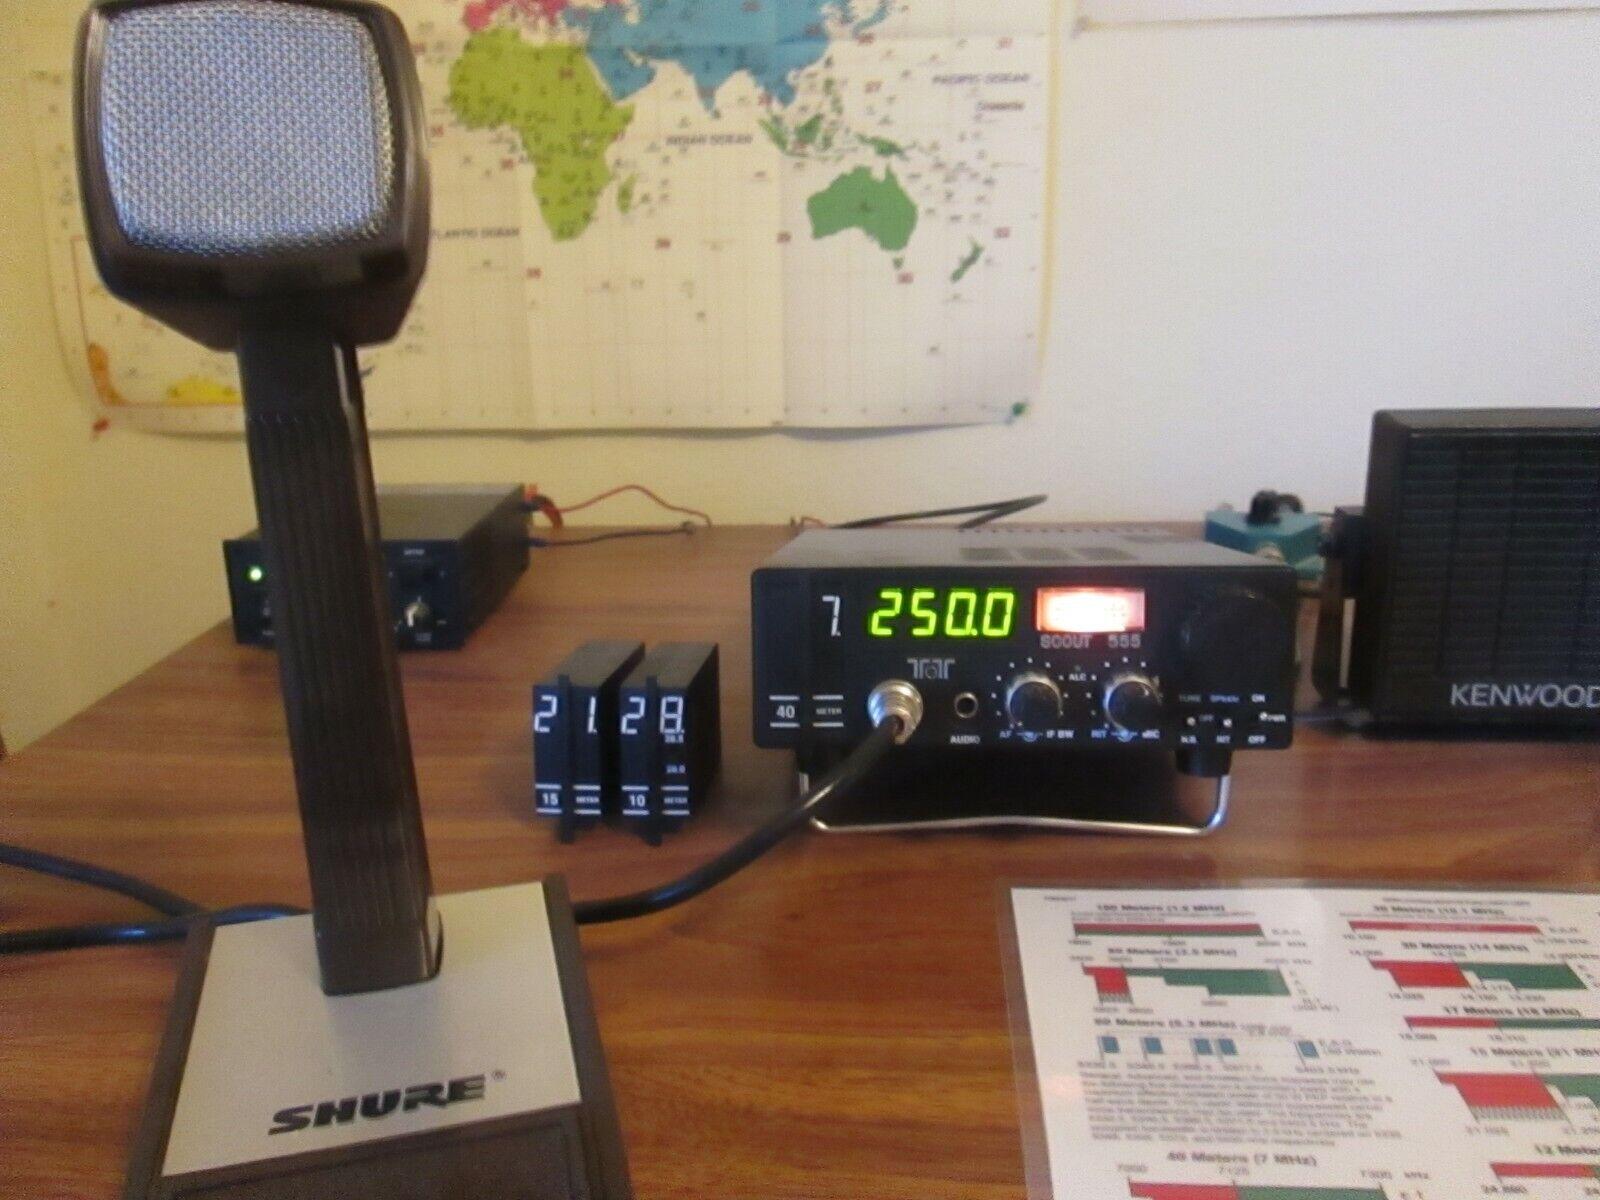 Ten Tec 586 Paragon Ii Ham Radio Transceiver For Sale Online Ebay